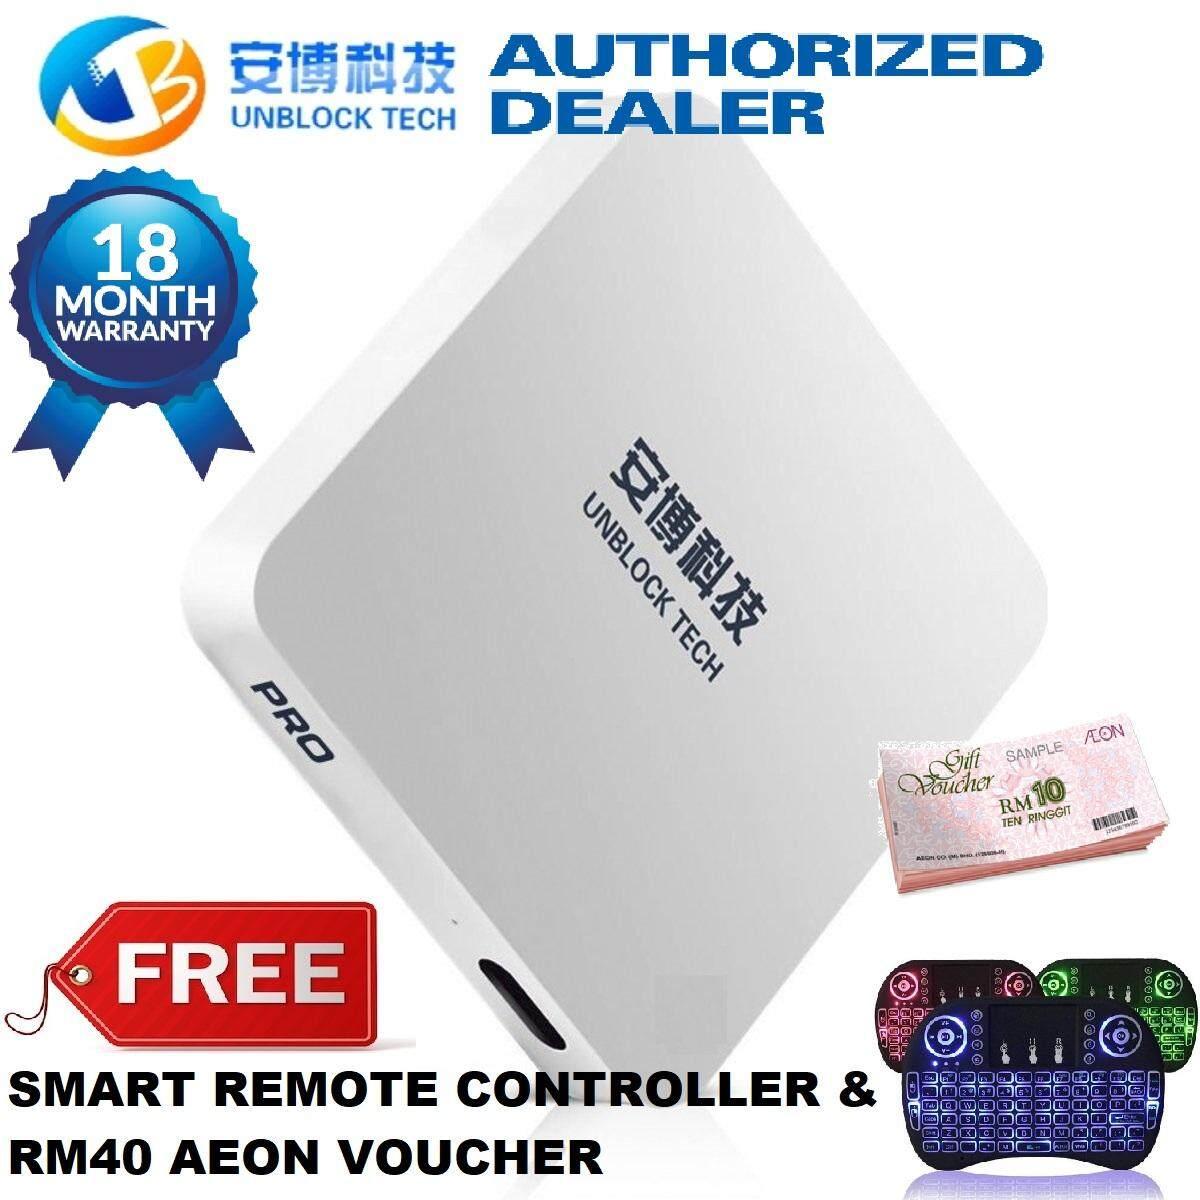 *RM550 00* Ubox 2018 Upro i900 16G Pro BT Bluetooth